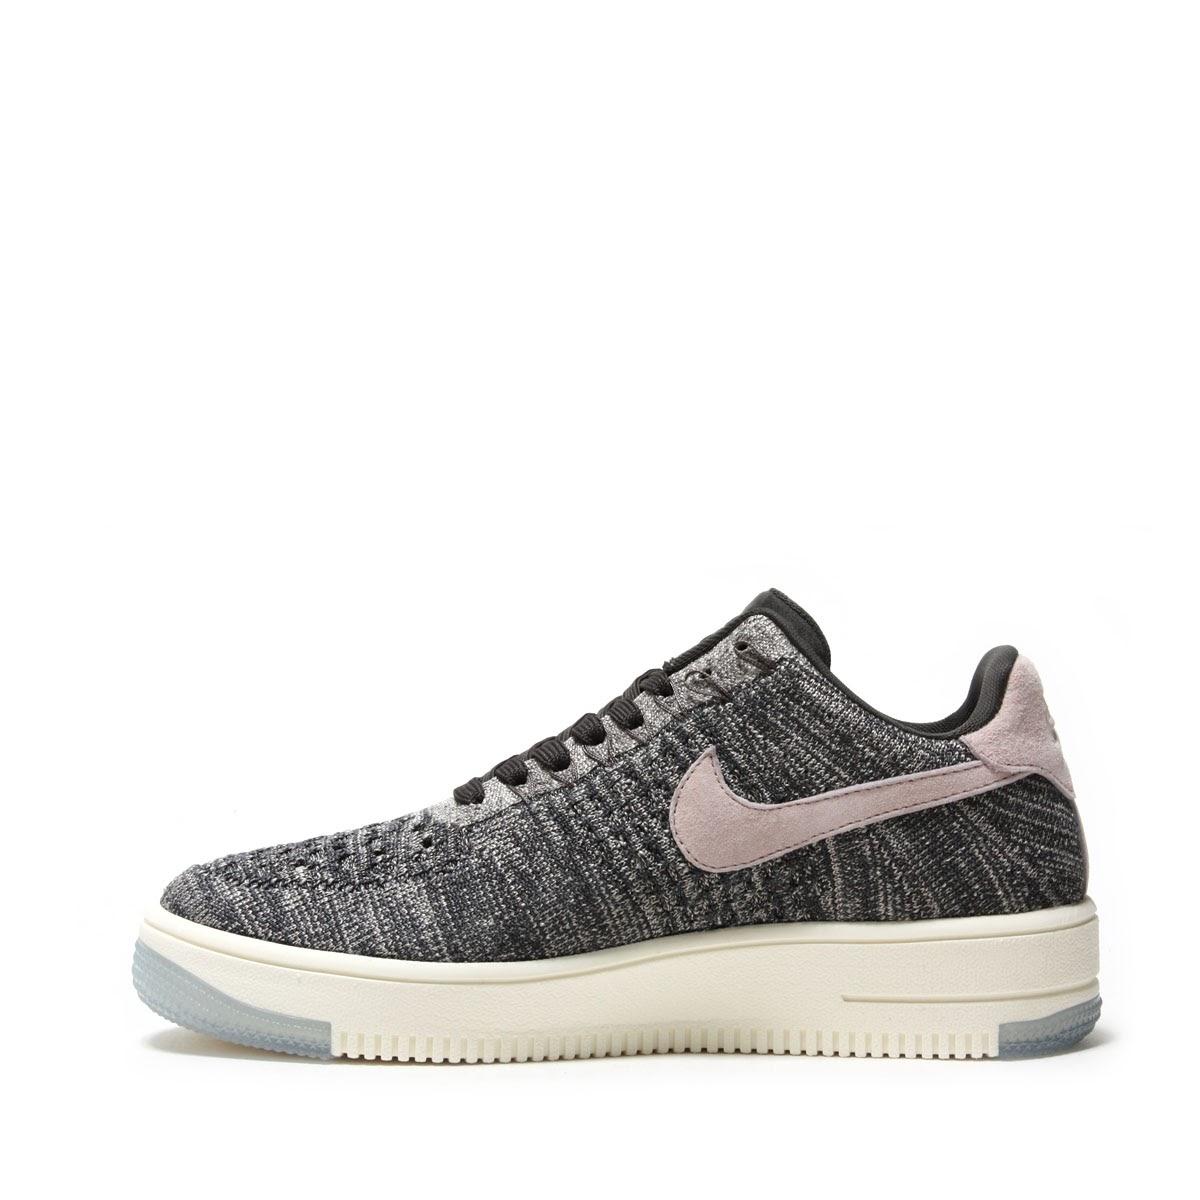 6e9954c1ec79e NIKE W AF1 FLYKNIT LOW (MIDNIGHT FOG SILT RED-IVORY-STRING) (Nike women AF1  fly knit low)